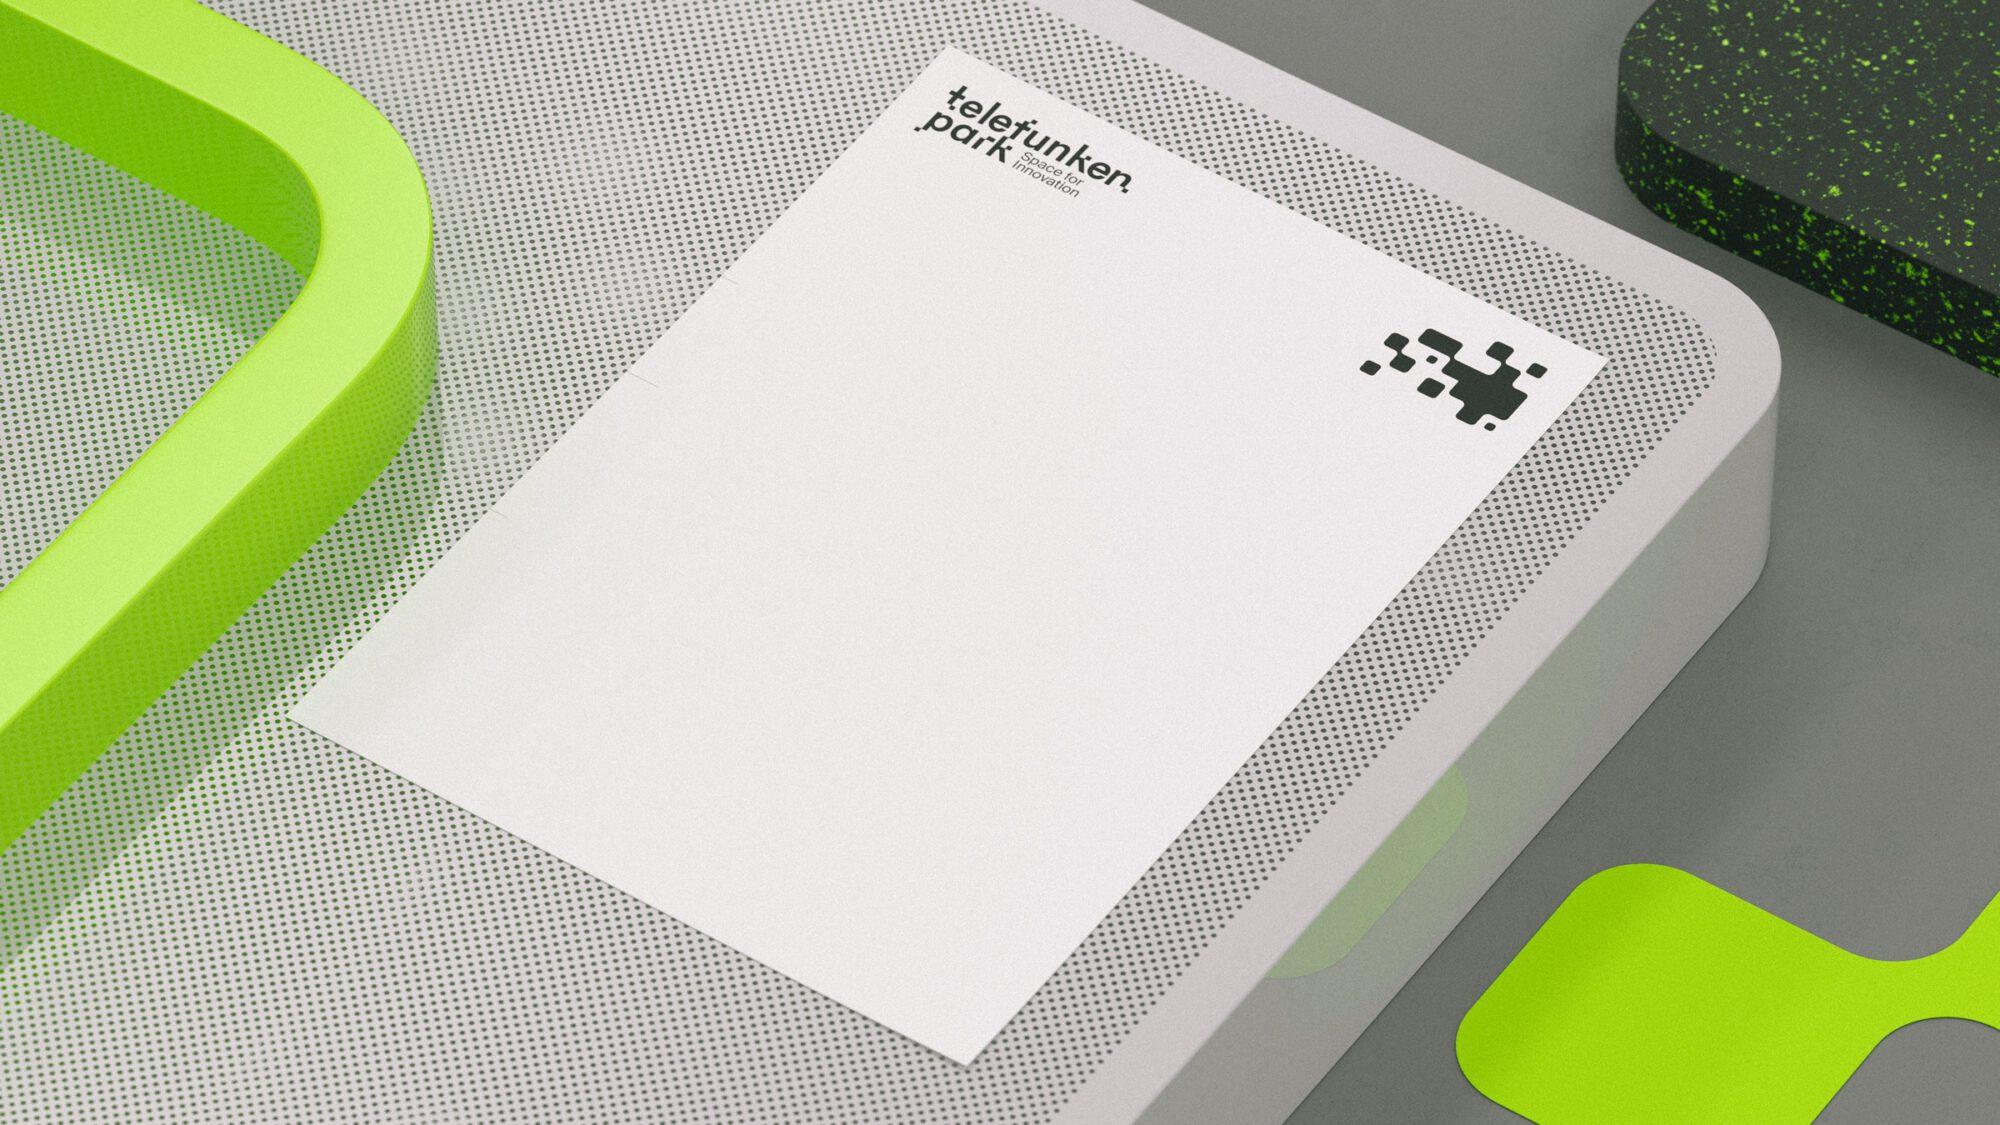 Briefpapier des Technologieparks Telefunkenpark in Heilbronn am neckar